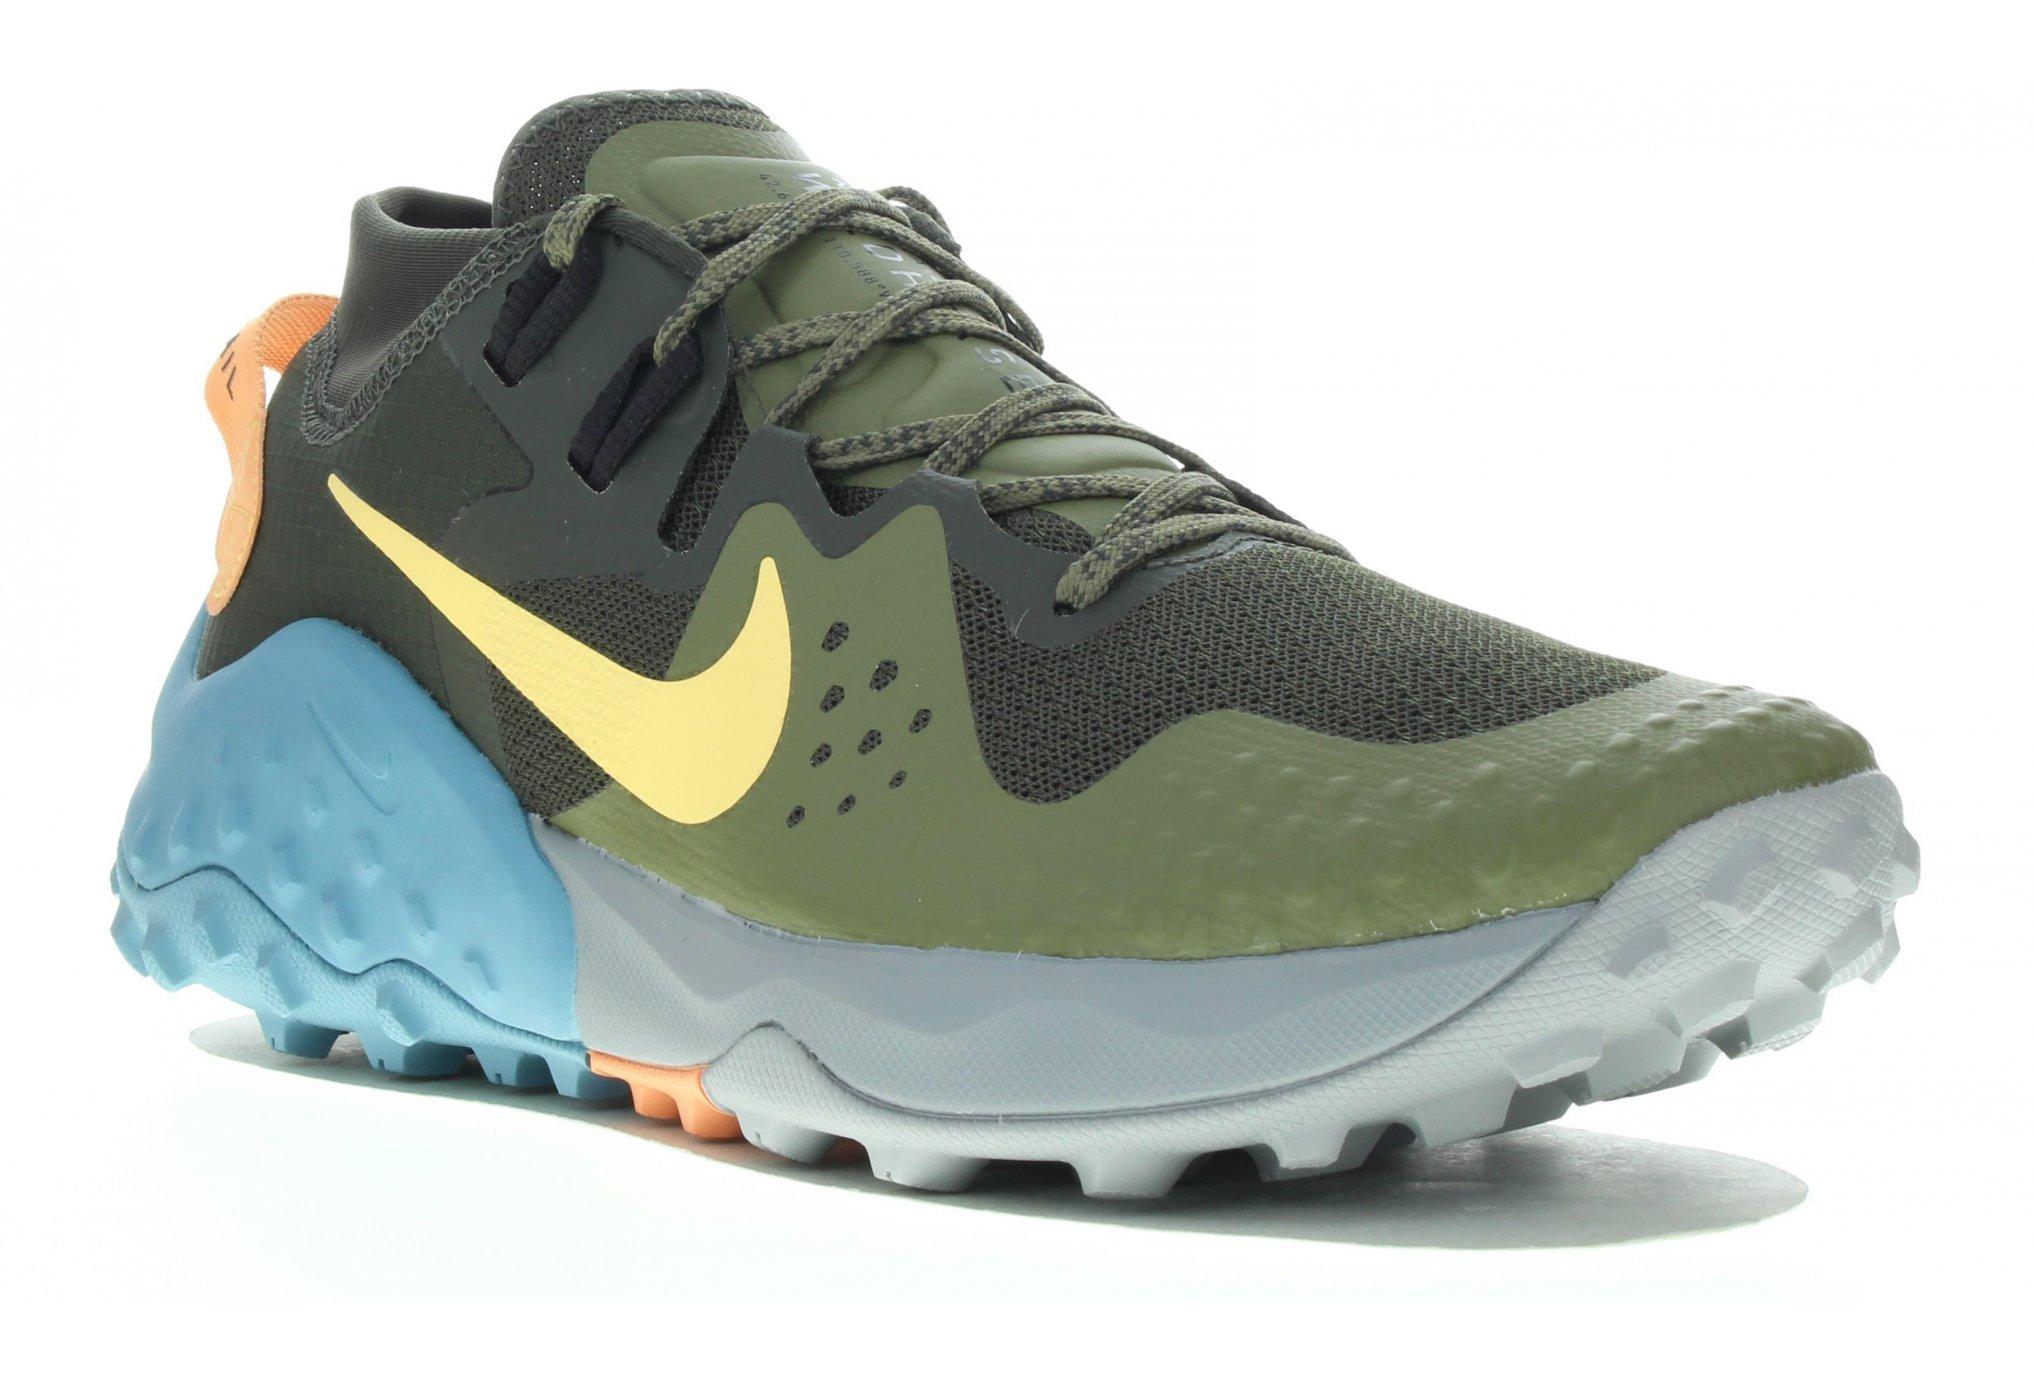 Nike Wildhorse 6 Chaussures homme